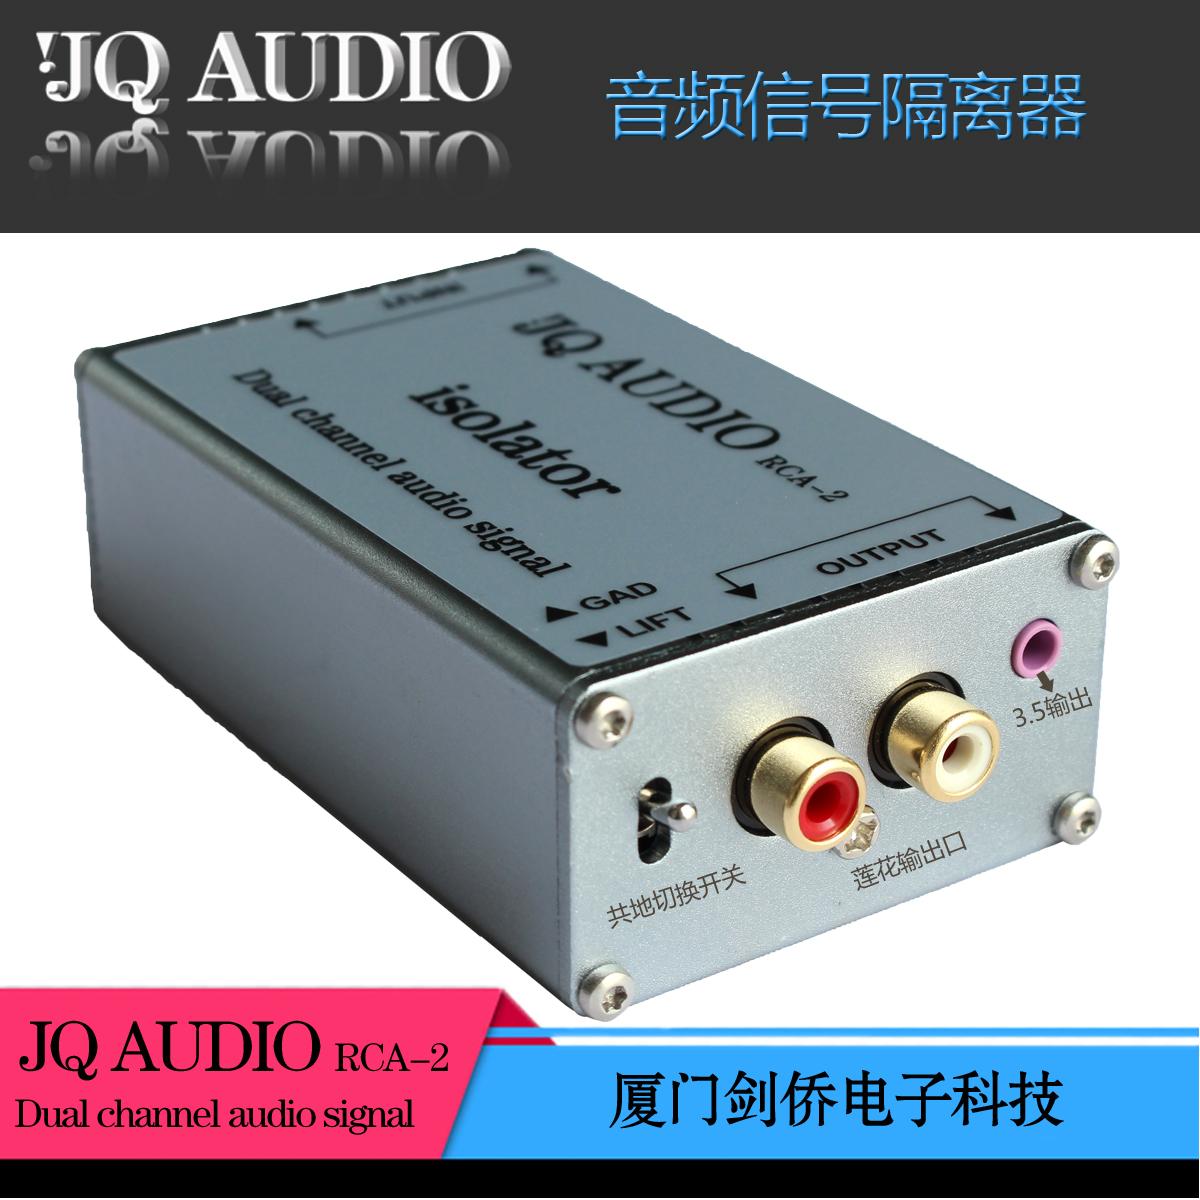 JQAUDIO RCA-2 звуковая частота изоляция устройство звук электрический ток звук изоляция компьютер шум звук изоляция